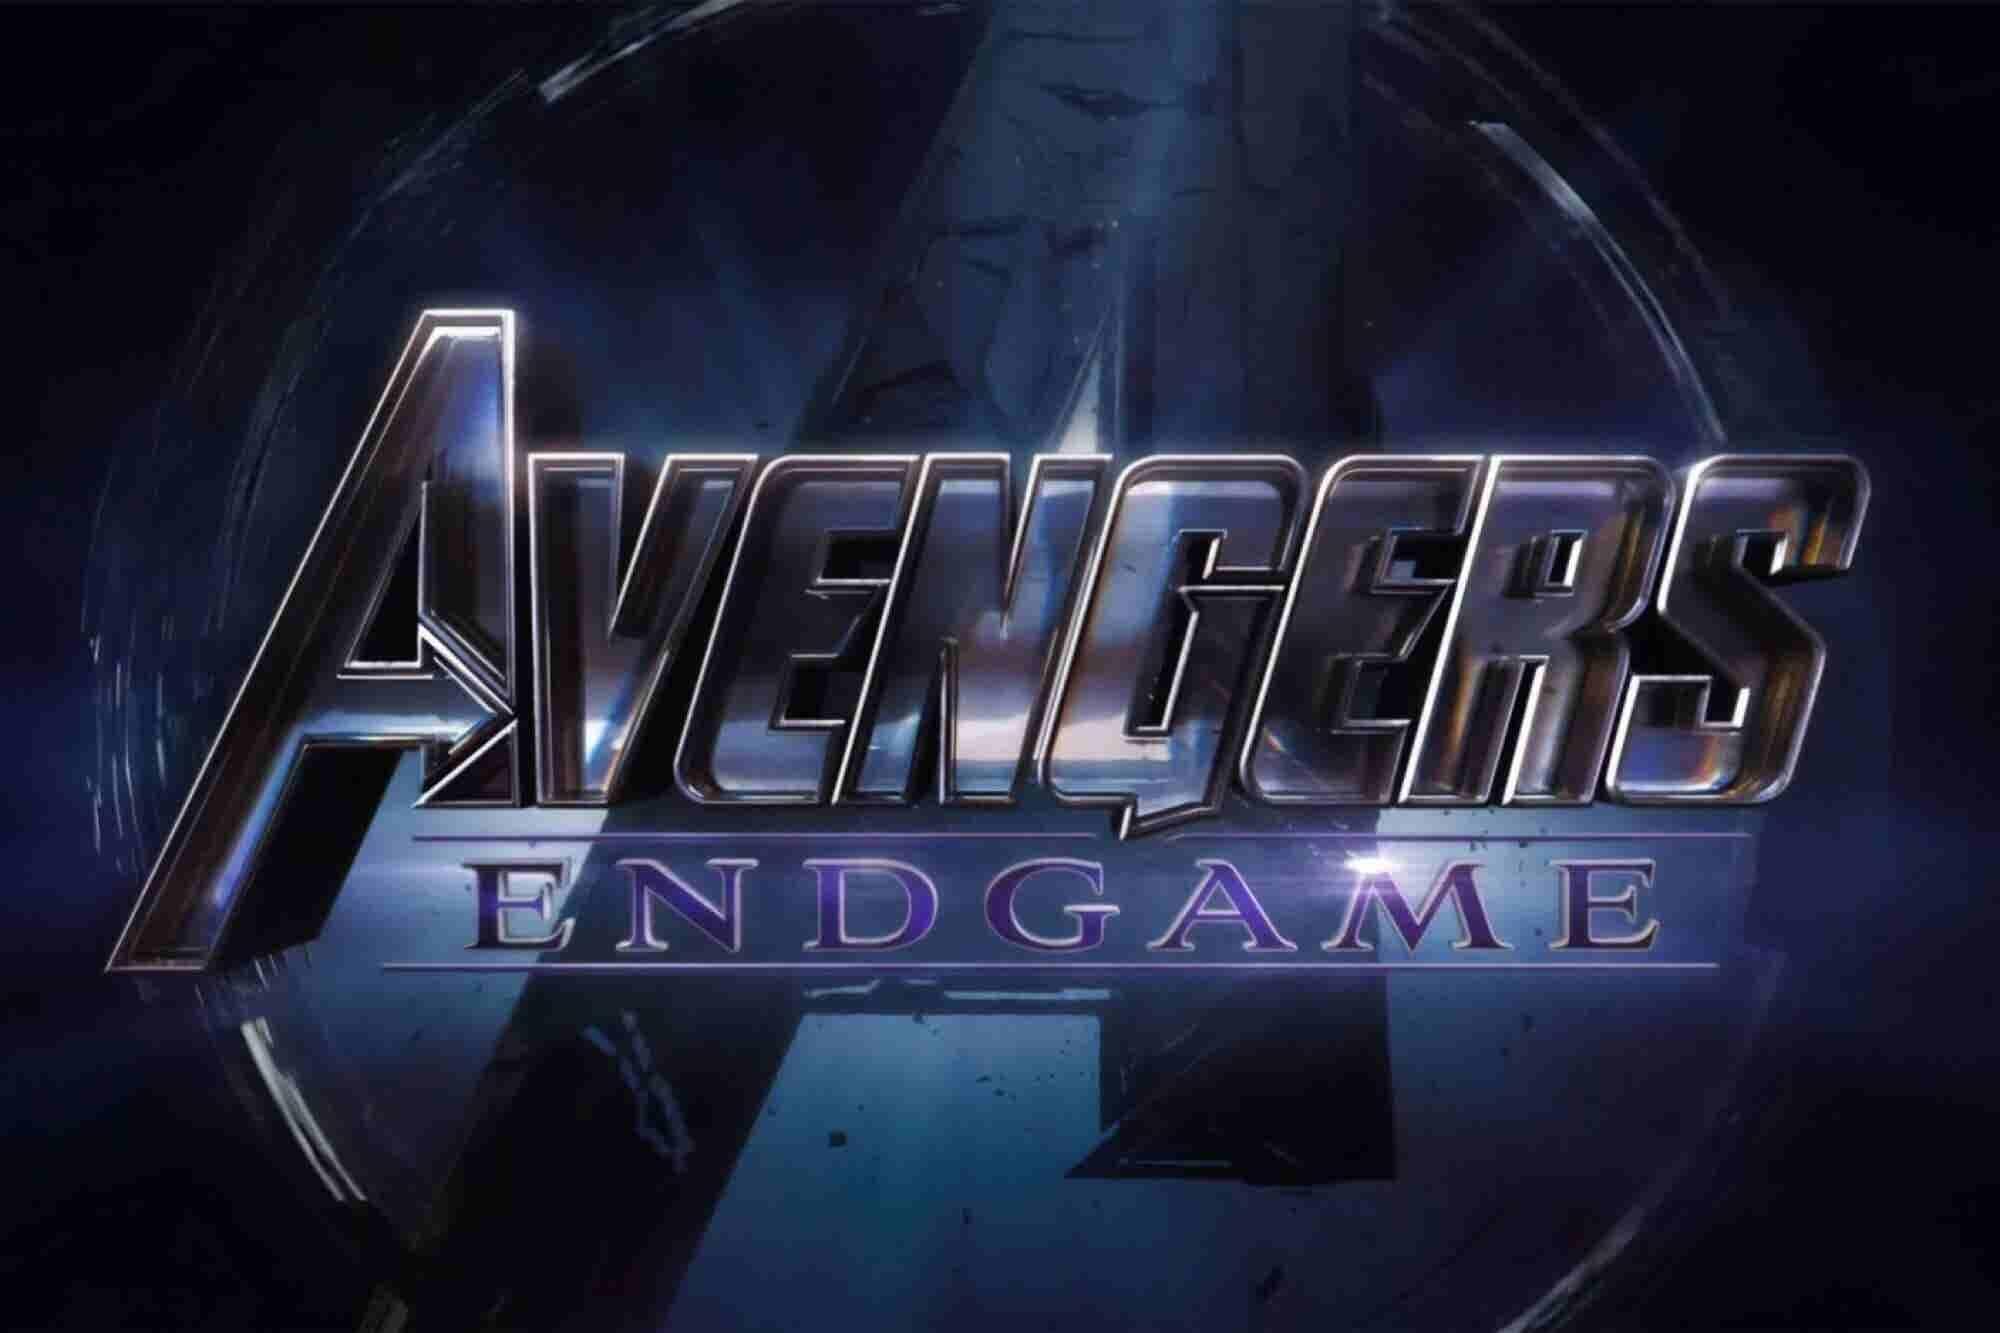 'Avengers: Endgame' Pre-Sales Are Crashing Movie Ticket Sites